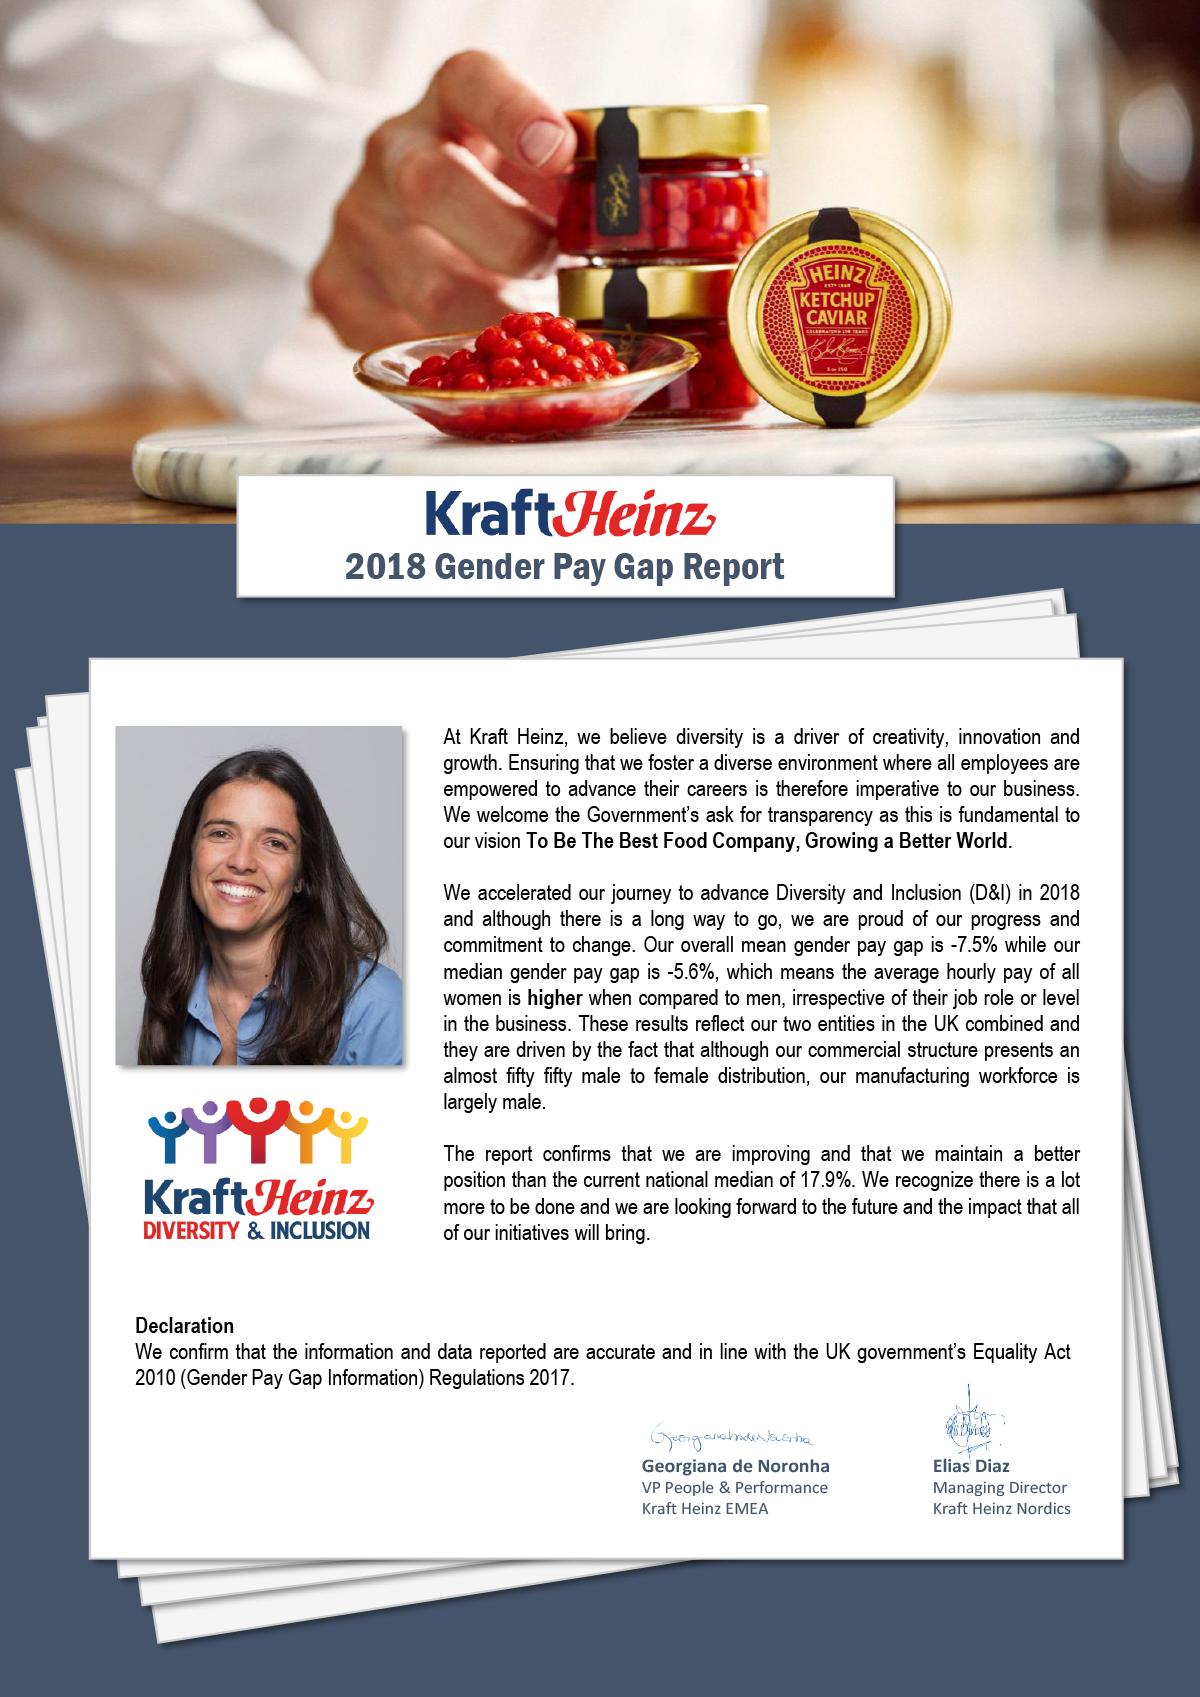 Kraft Heinz Gender Pay Gap slide 1